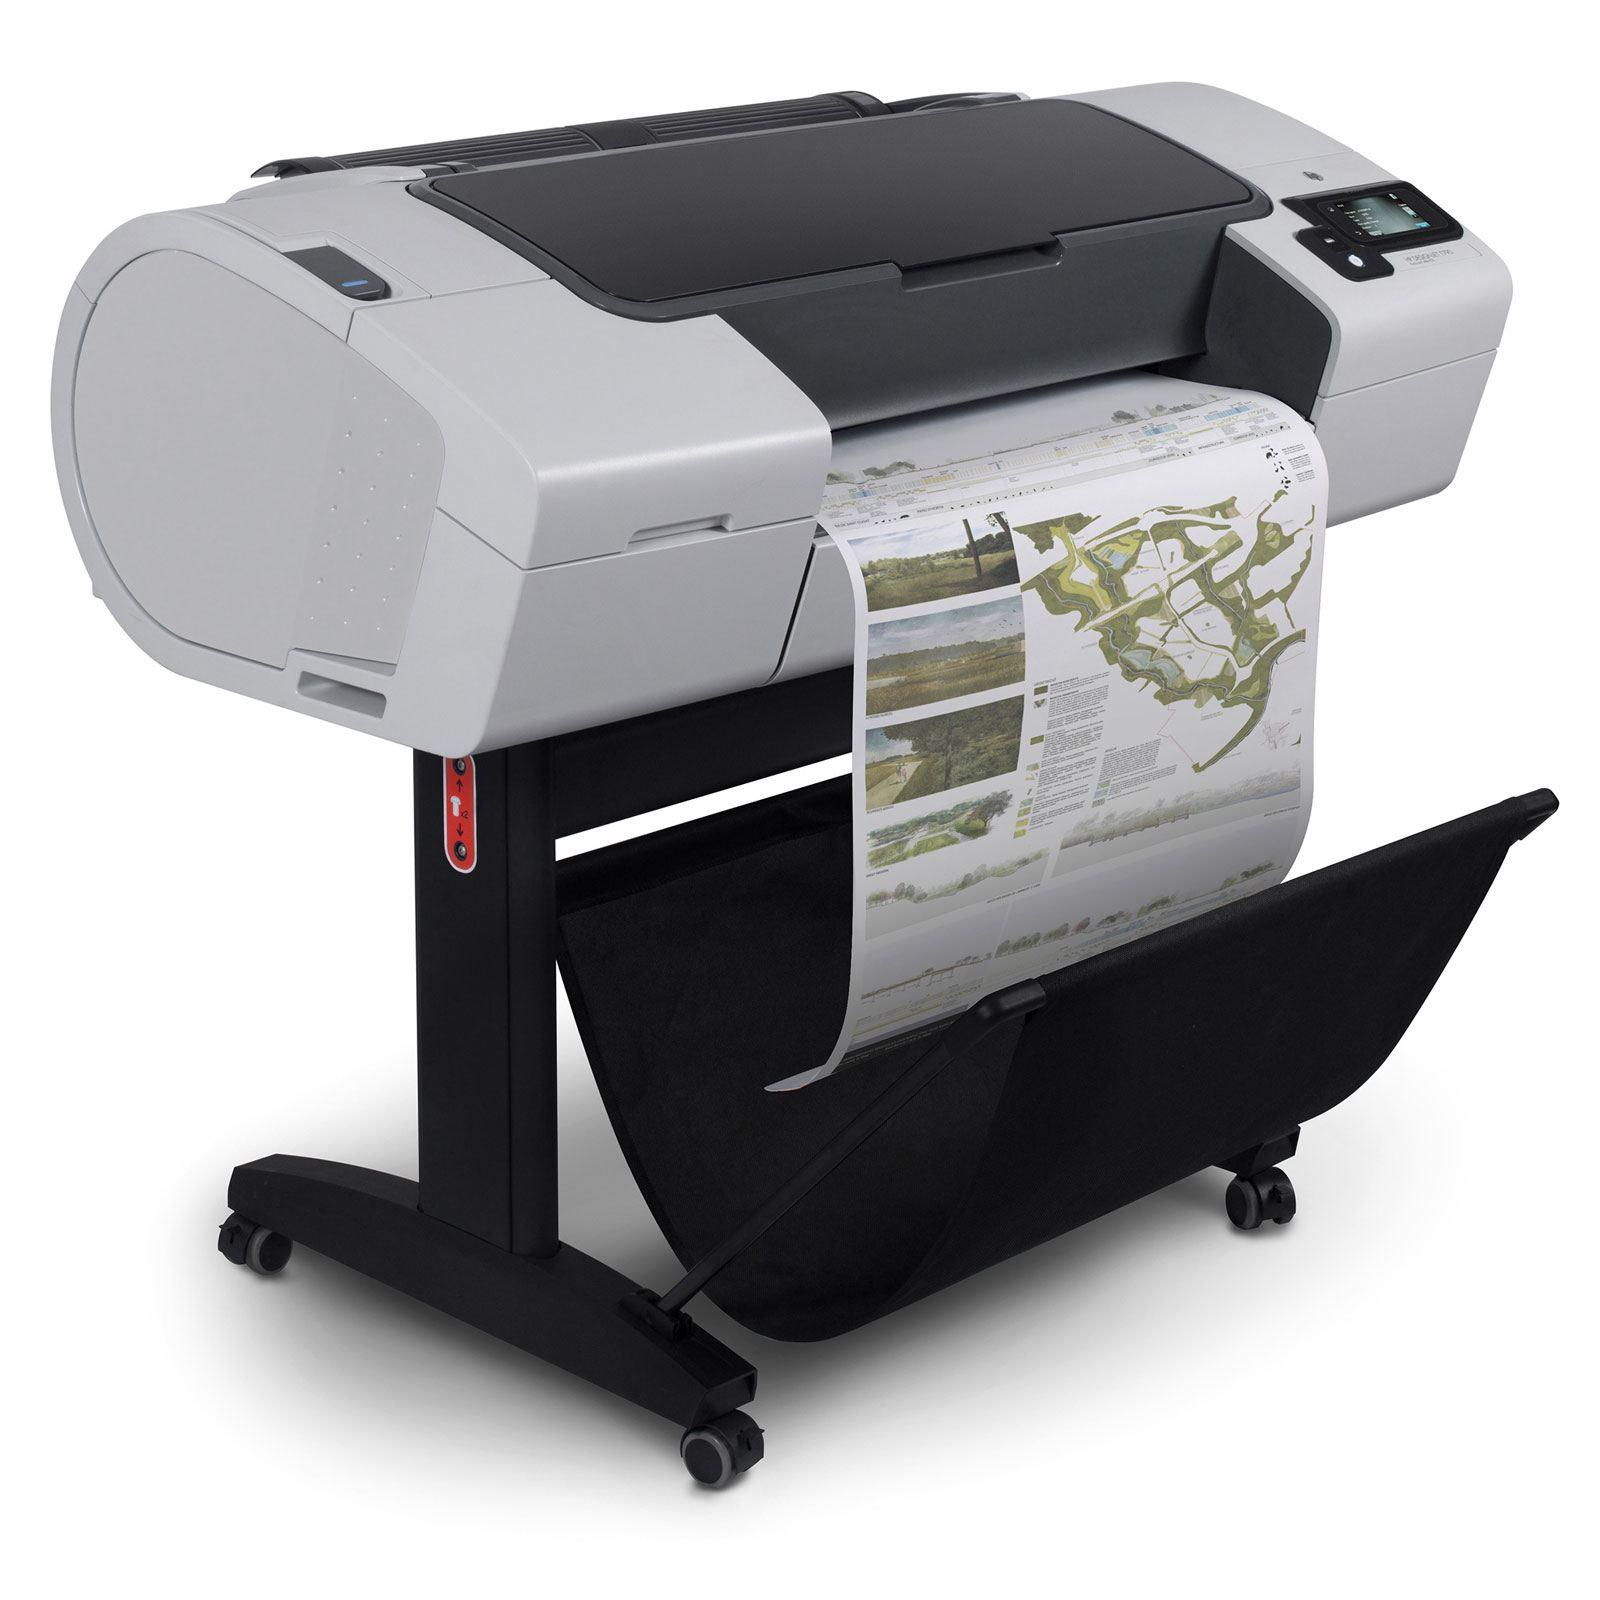 Плоттер HP Designjet T790 ePrinter